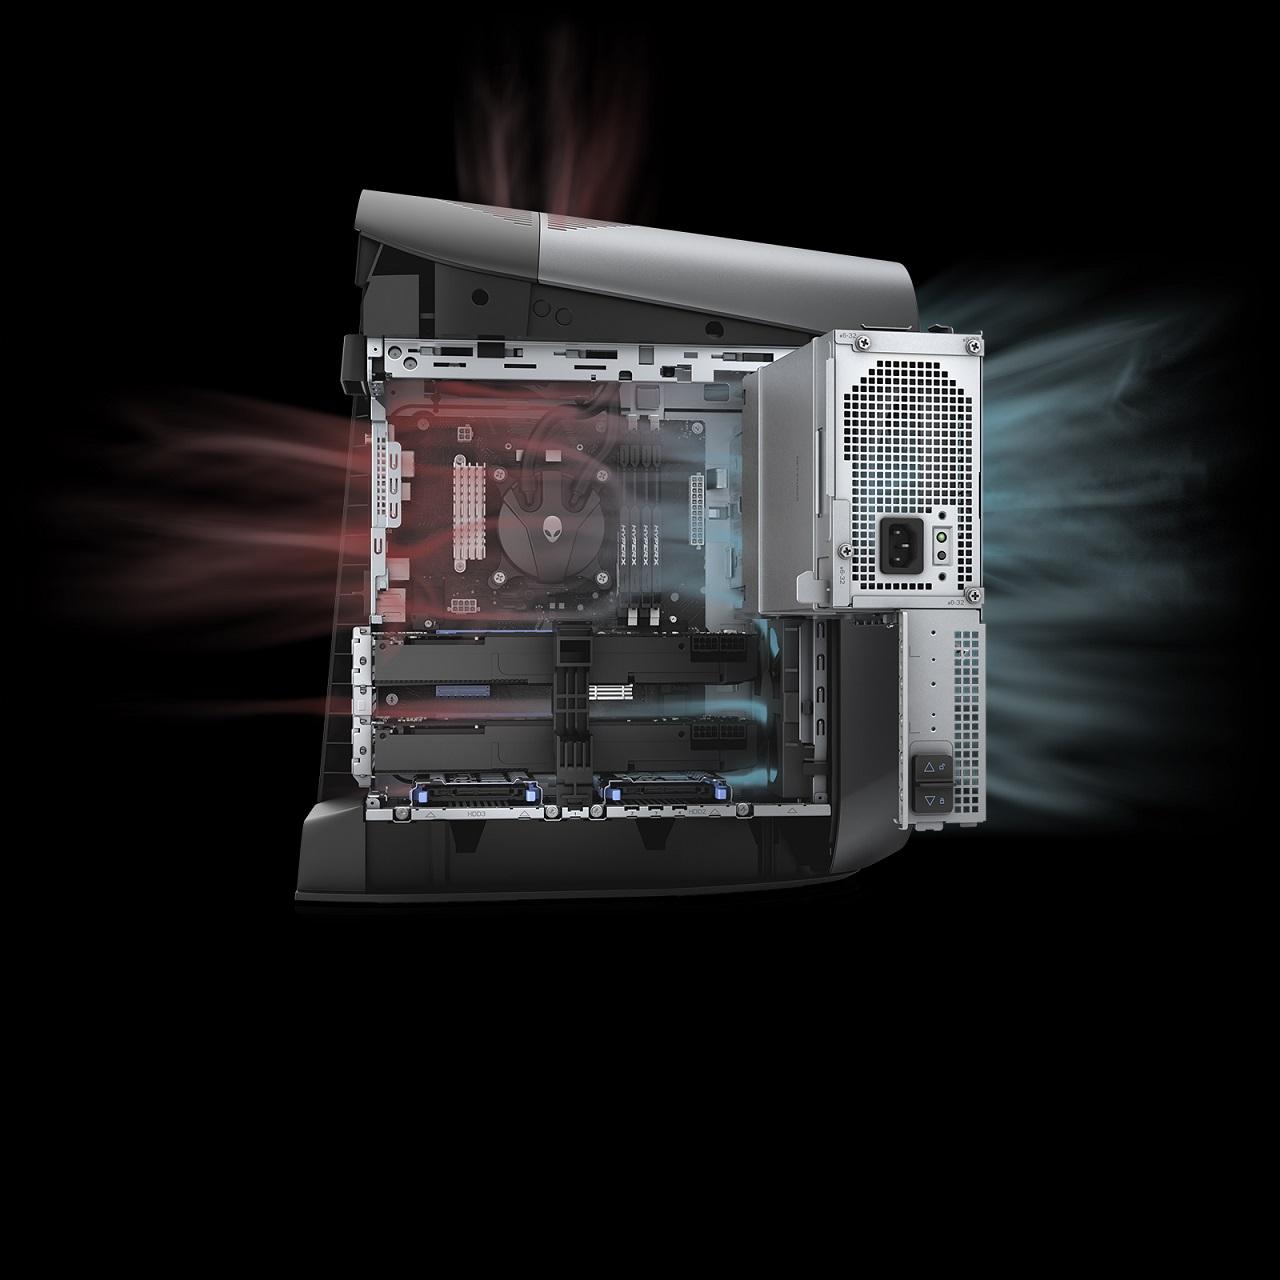 Dell has unveiled the Alienware Aurora R9 desktop at Gamescom 2019 9